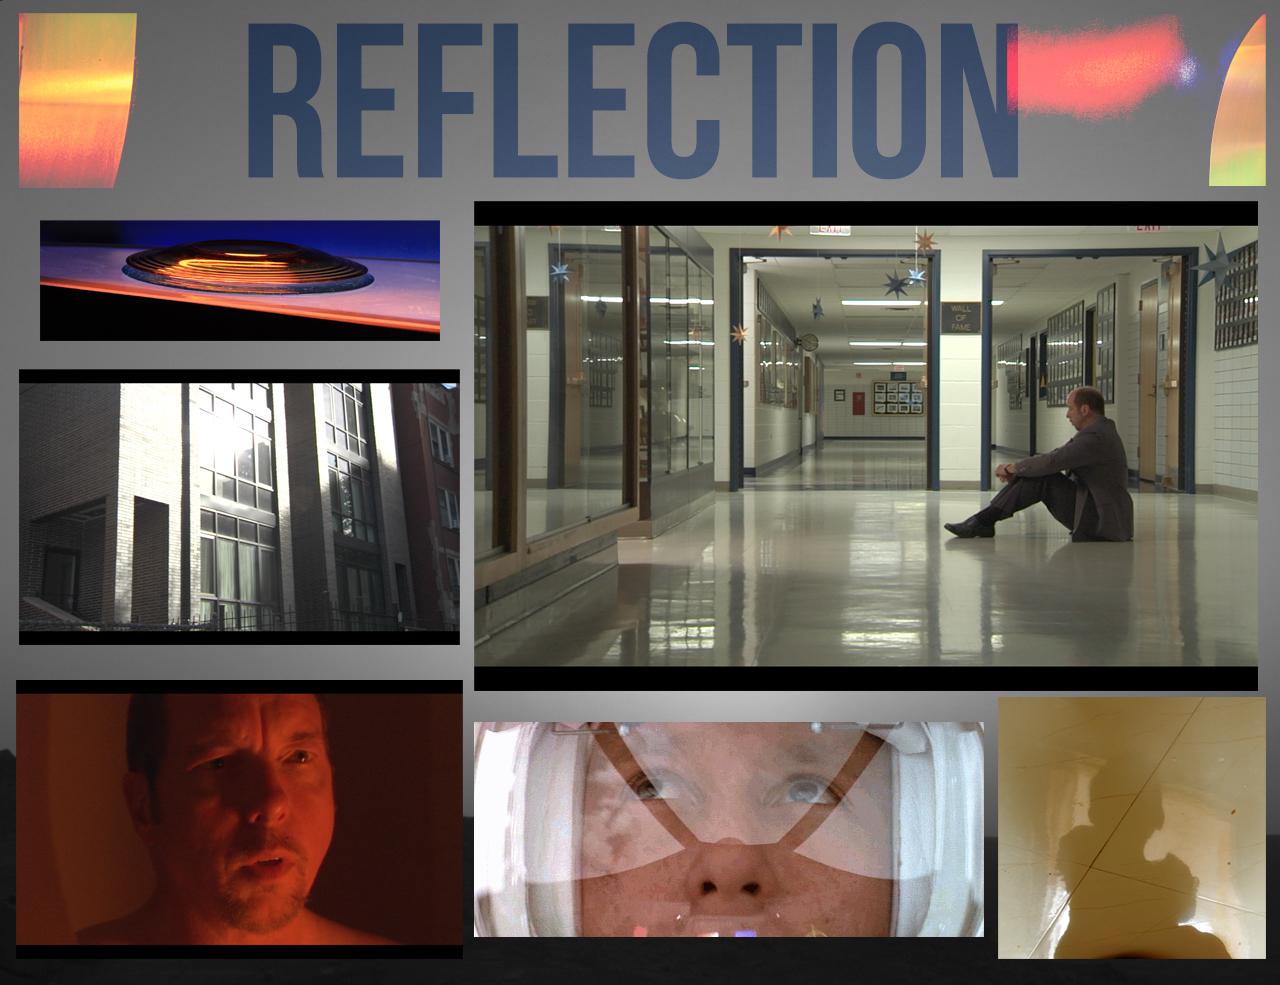 *reflection.jpg